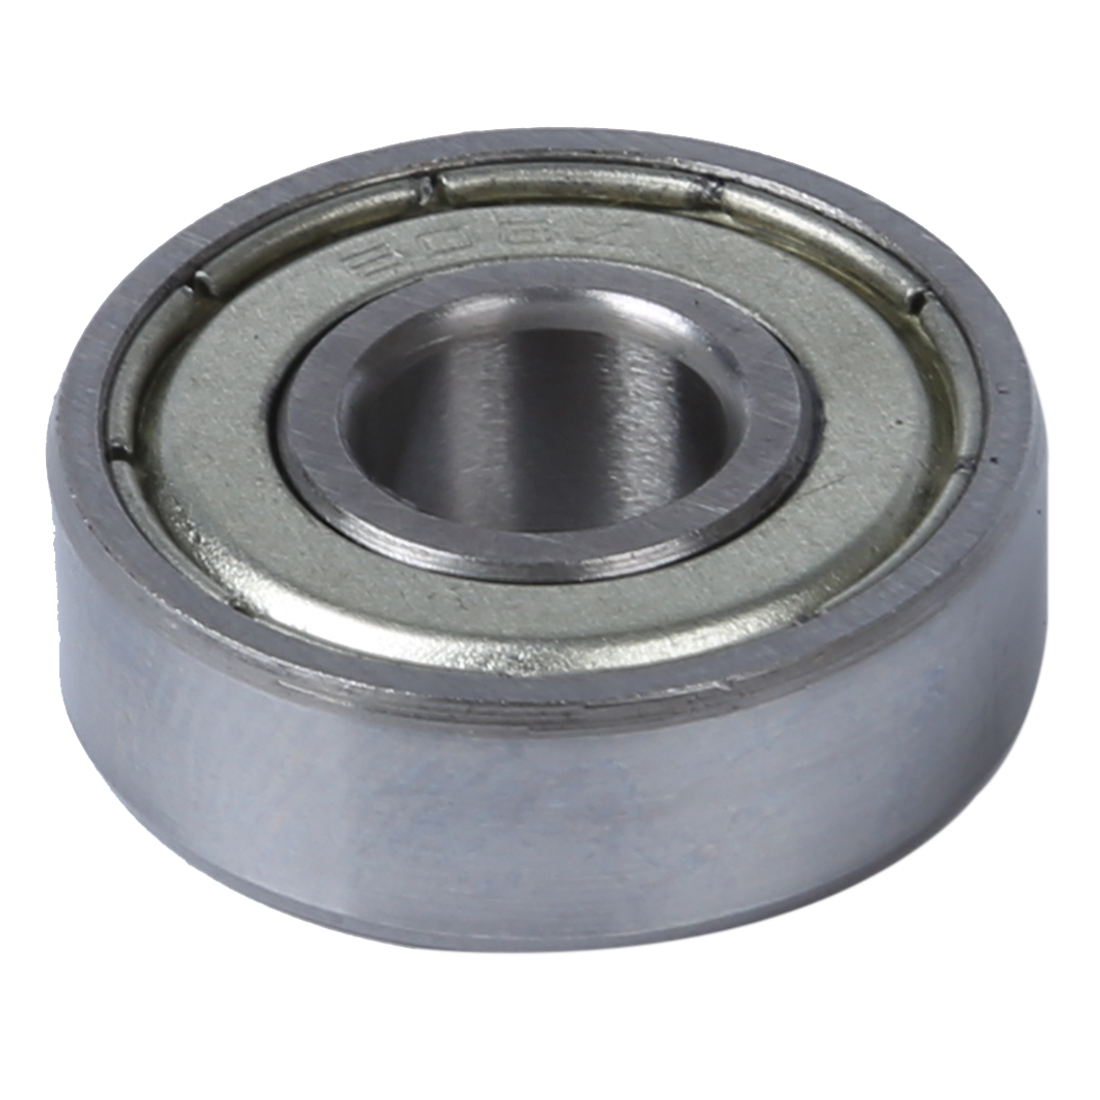 2 Pcs Single Shielded 608Z Miniature Deep Groove Ball Bearings Drop Shipping